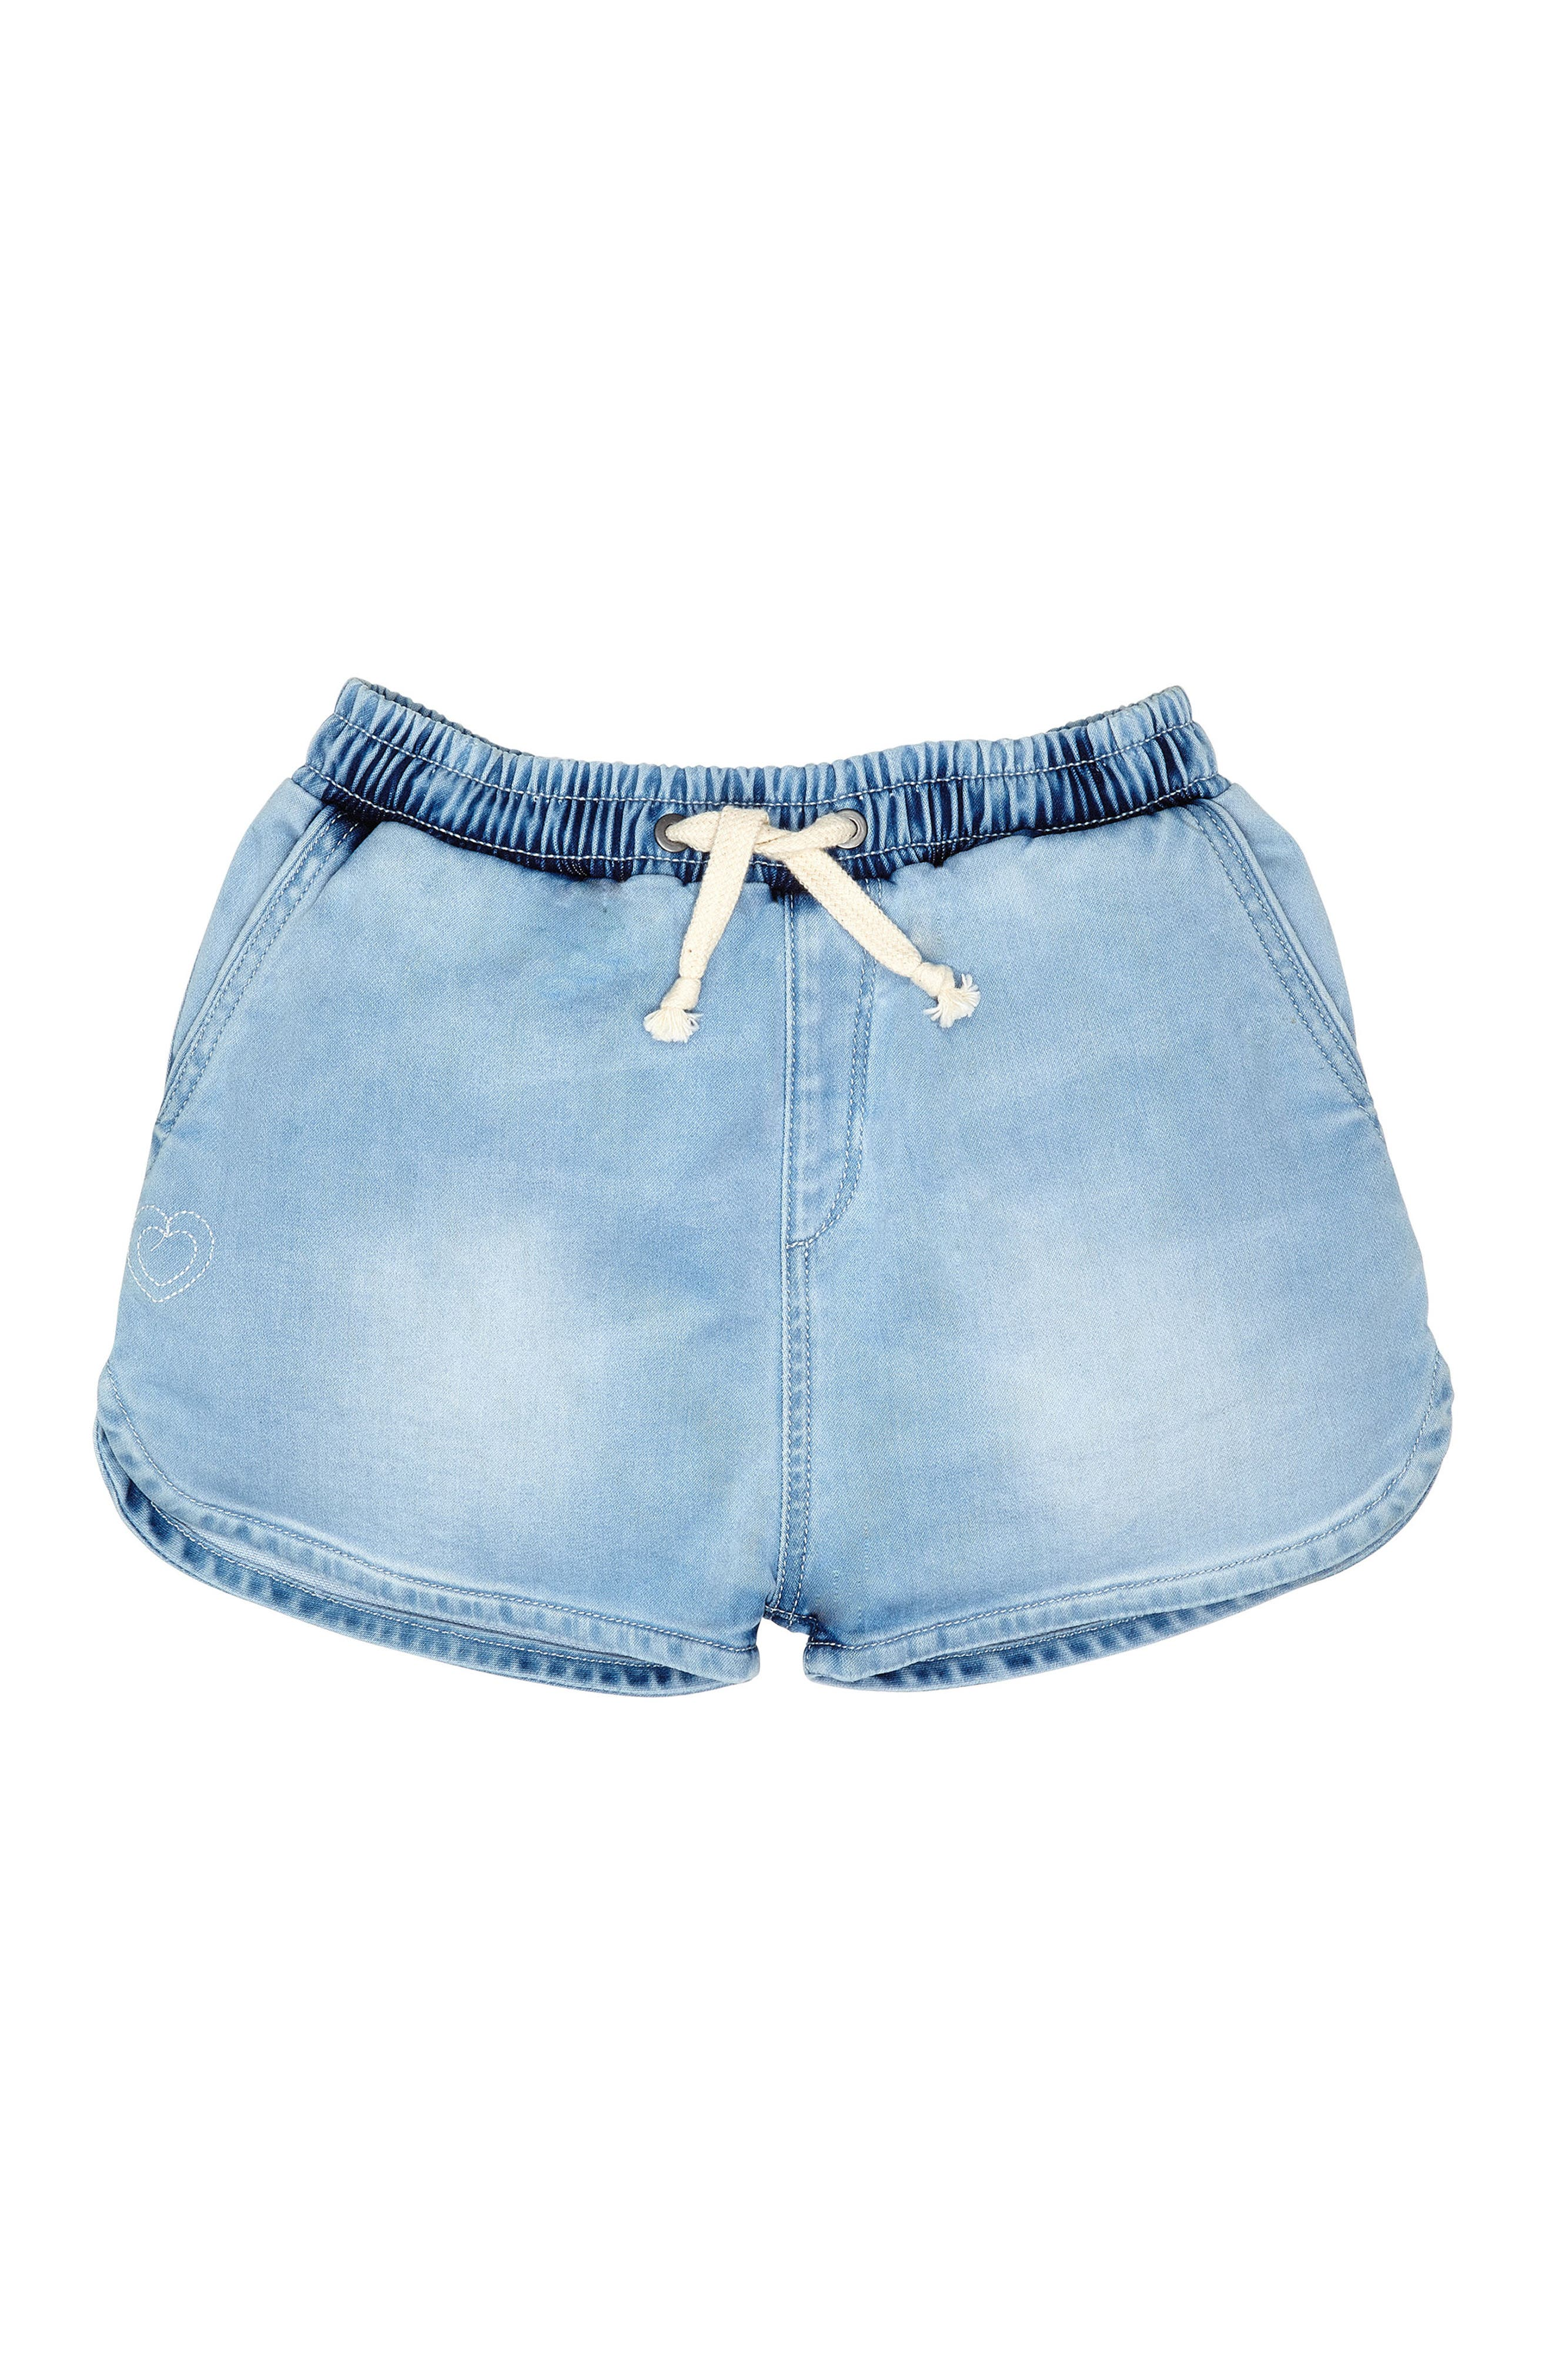 Denim Sport Shorts,                         Main,                         color, 405